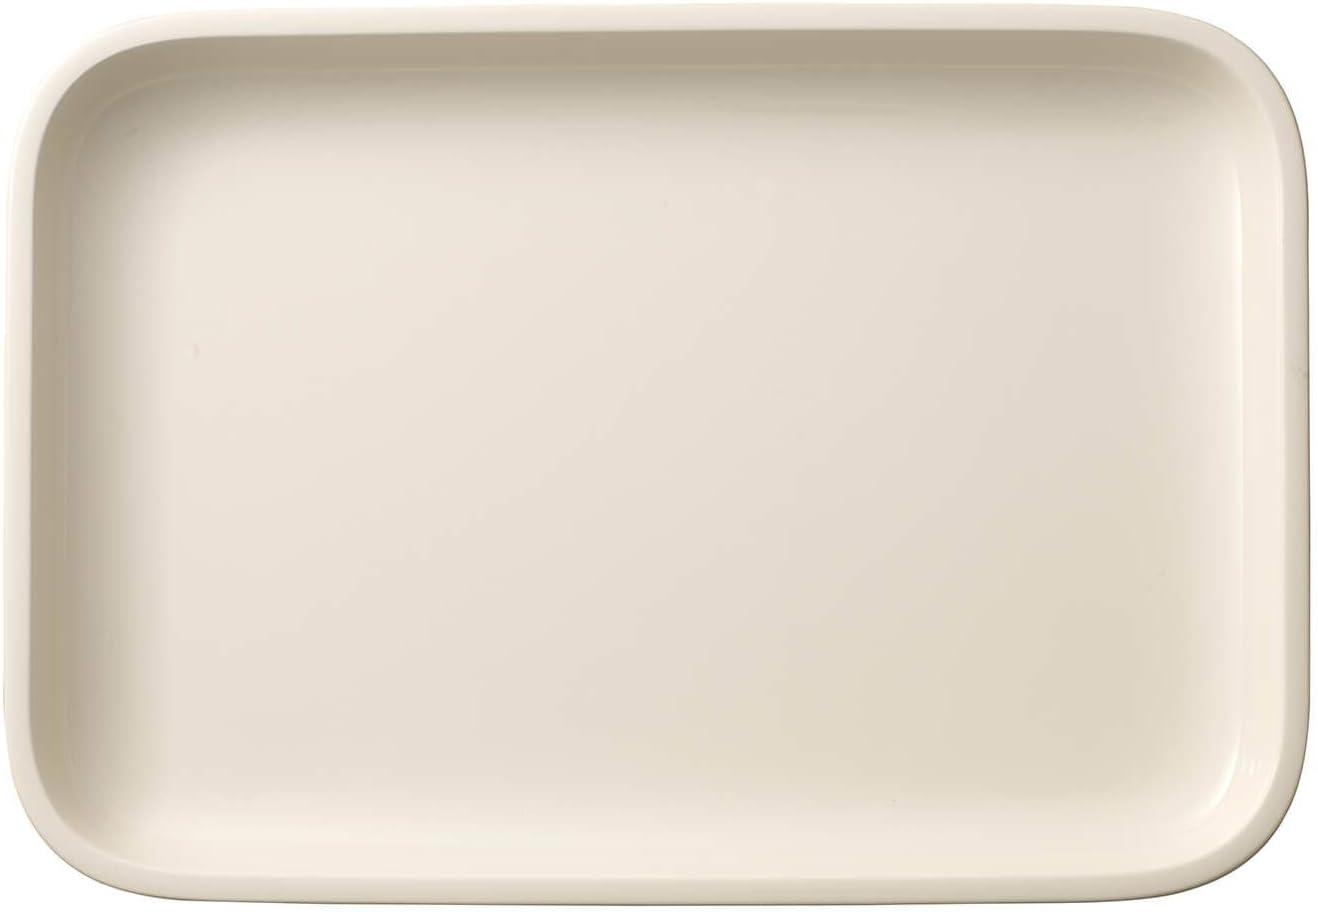 Villeroy & Boch Cooking Elements - Bandeja para Servir (Rectangular, 32 x 22 cm)